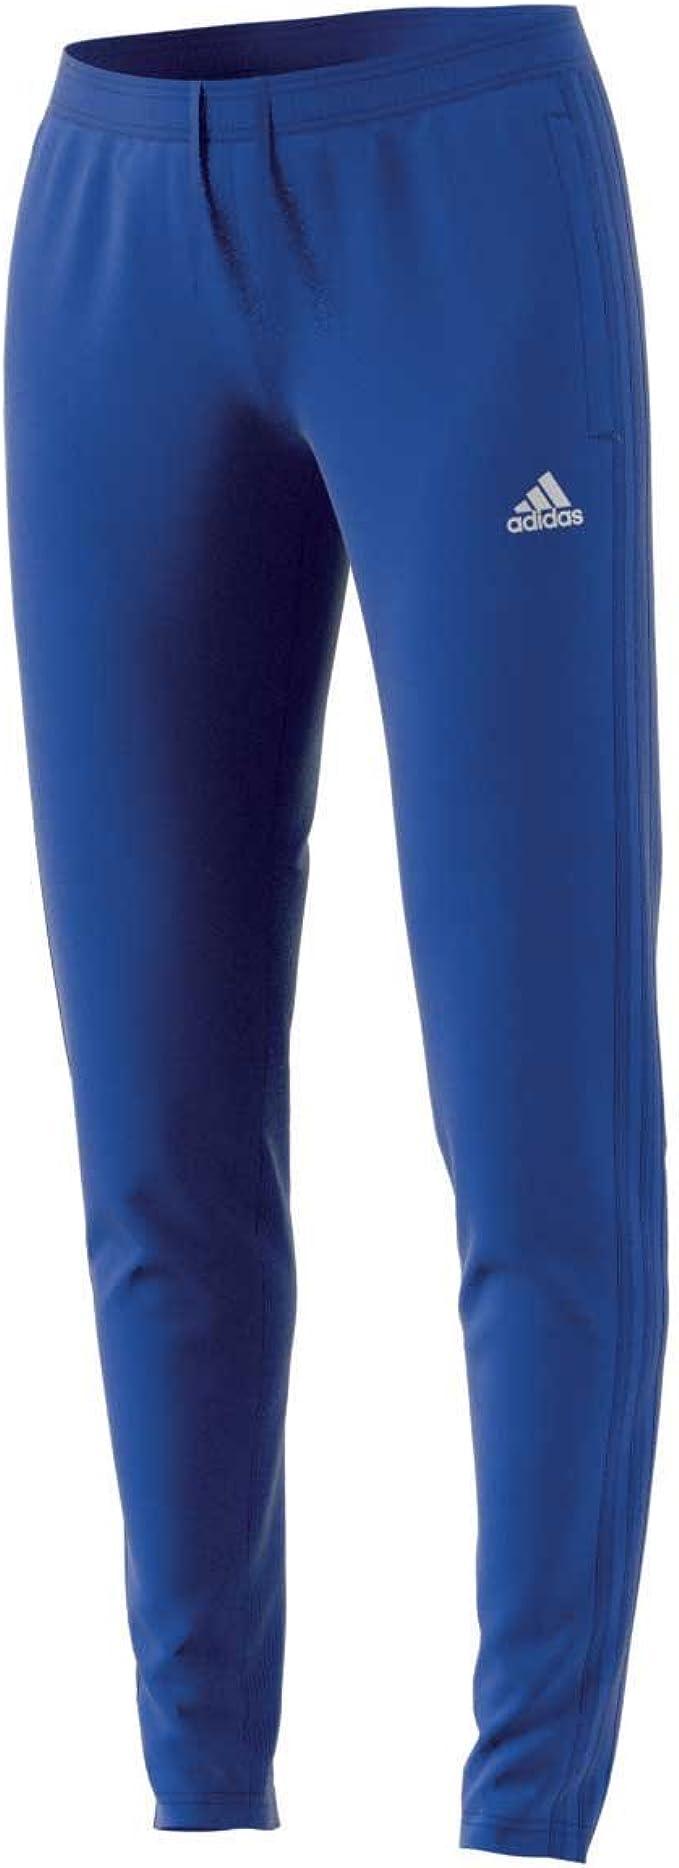 adidas Damen Trainingshose Condivo 18 Pants: Amazon.de ...